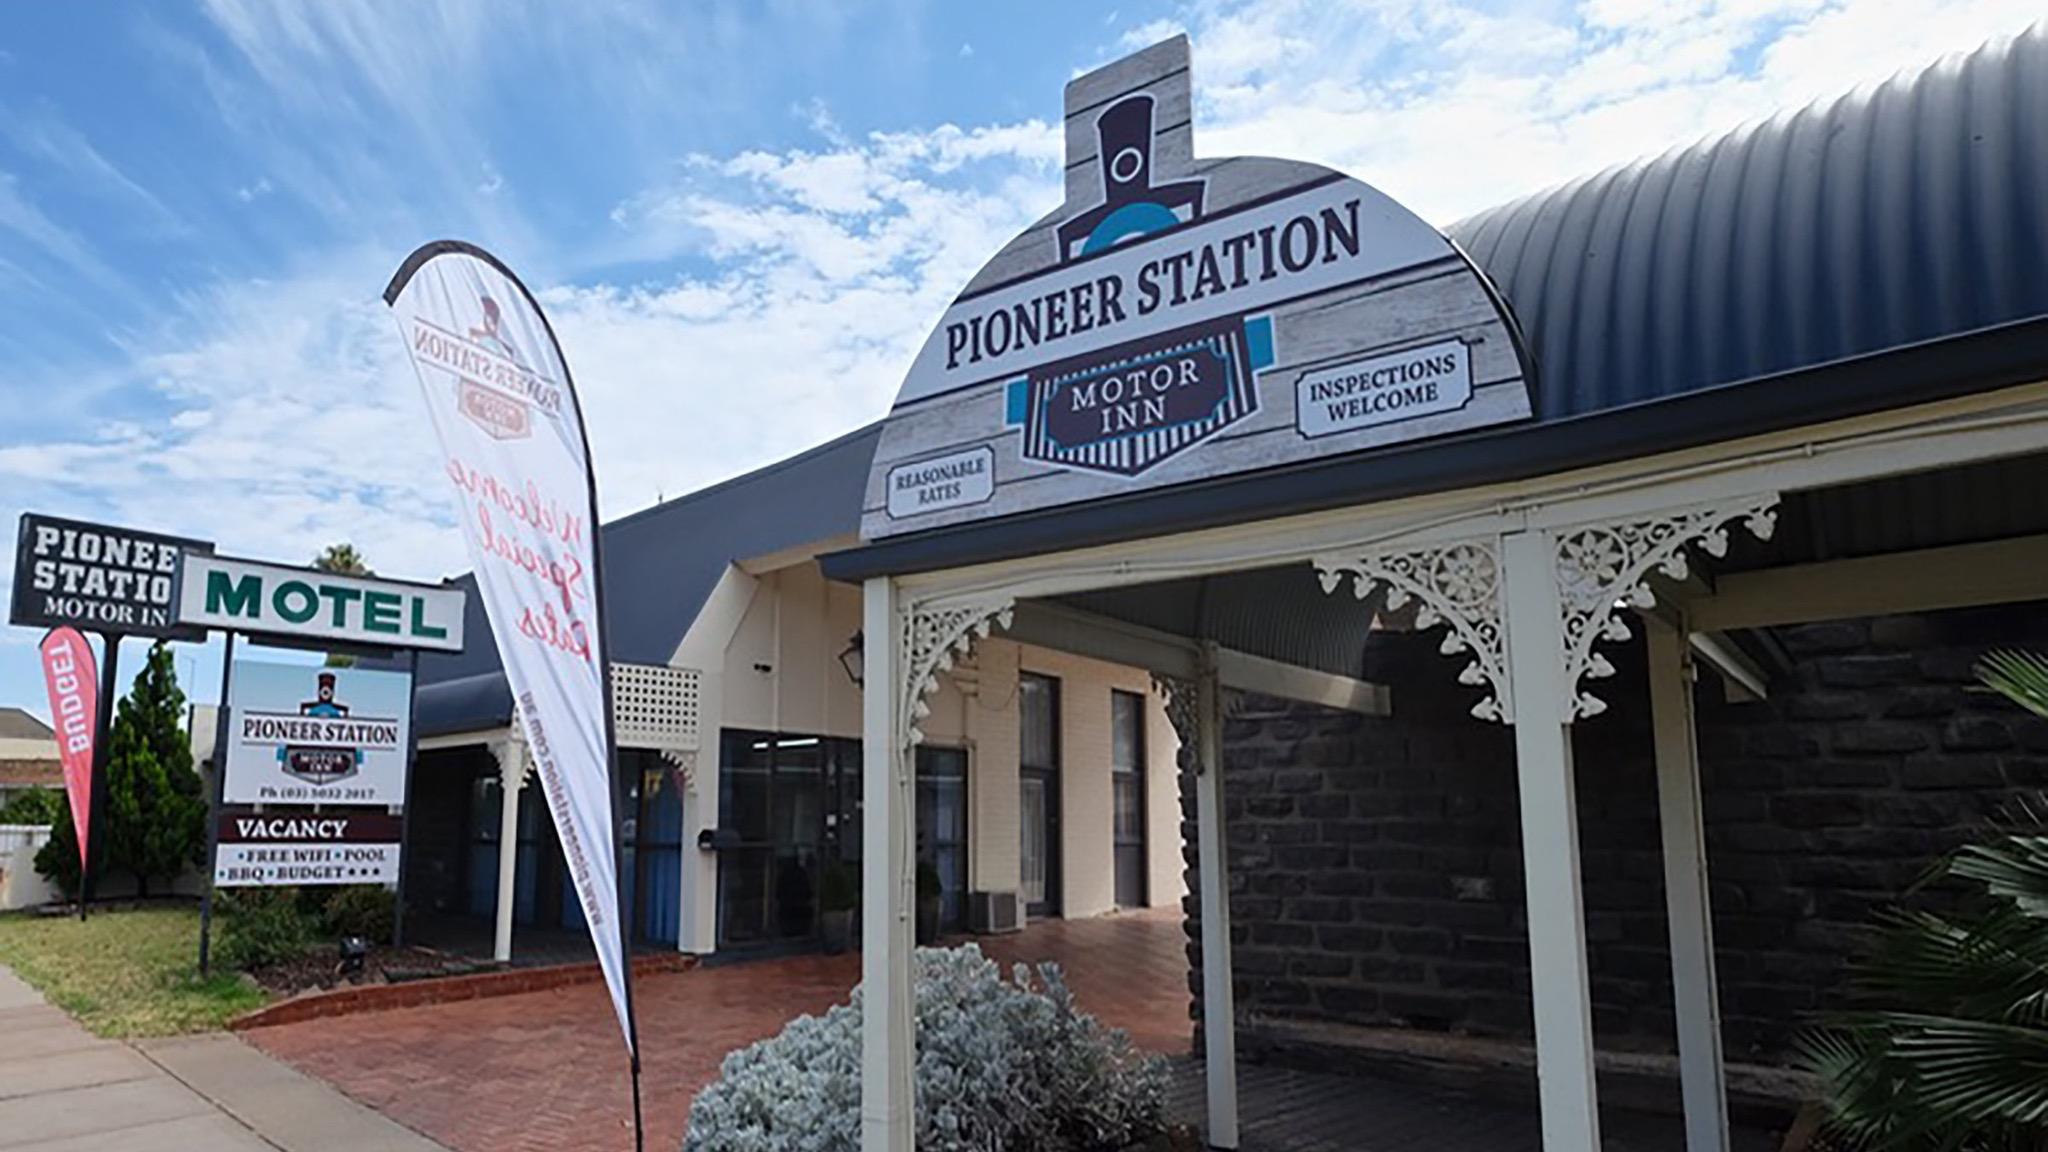 Pioneer Station Motor Inn